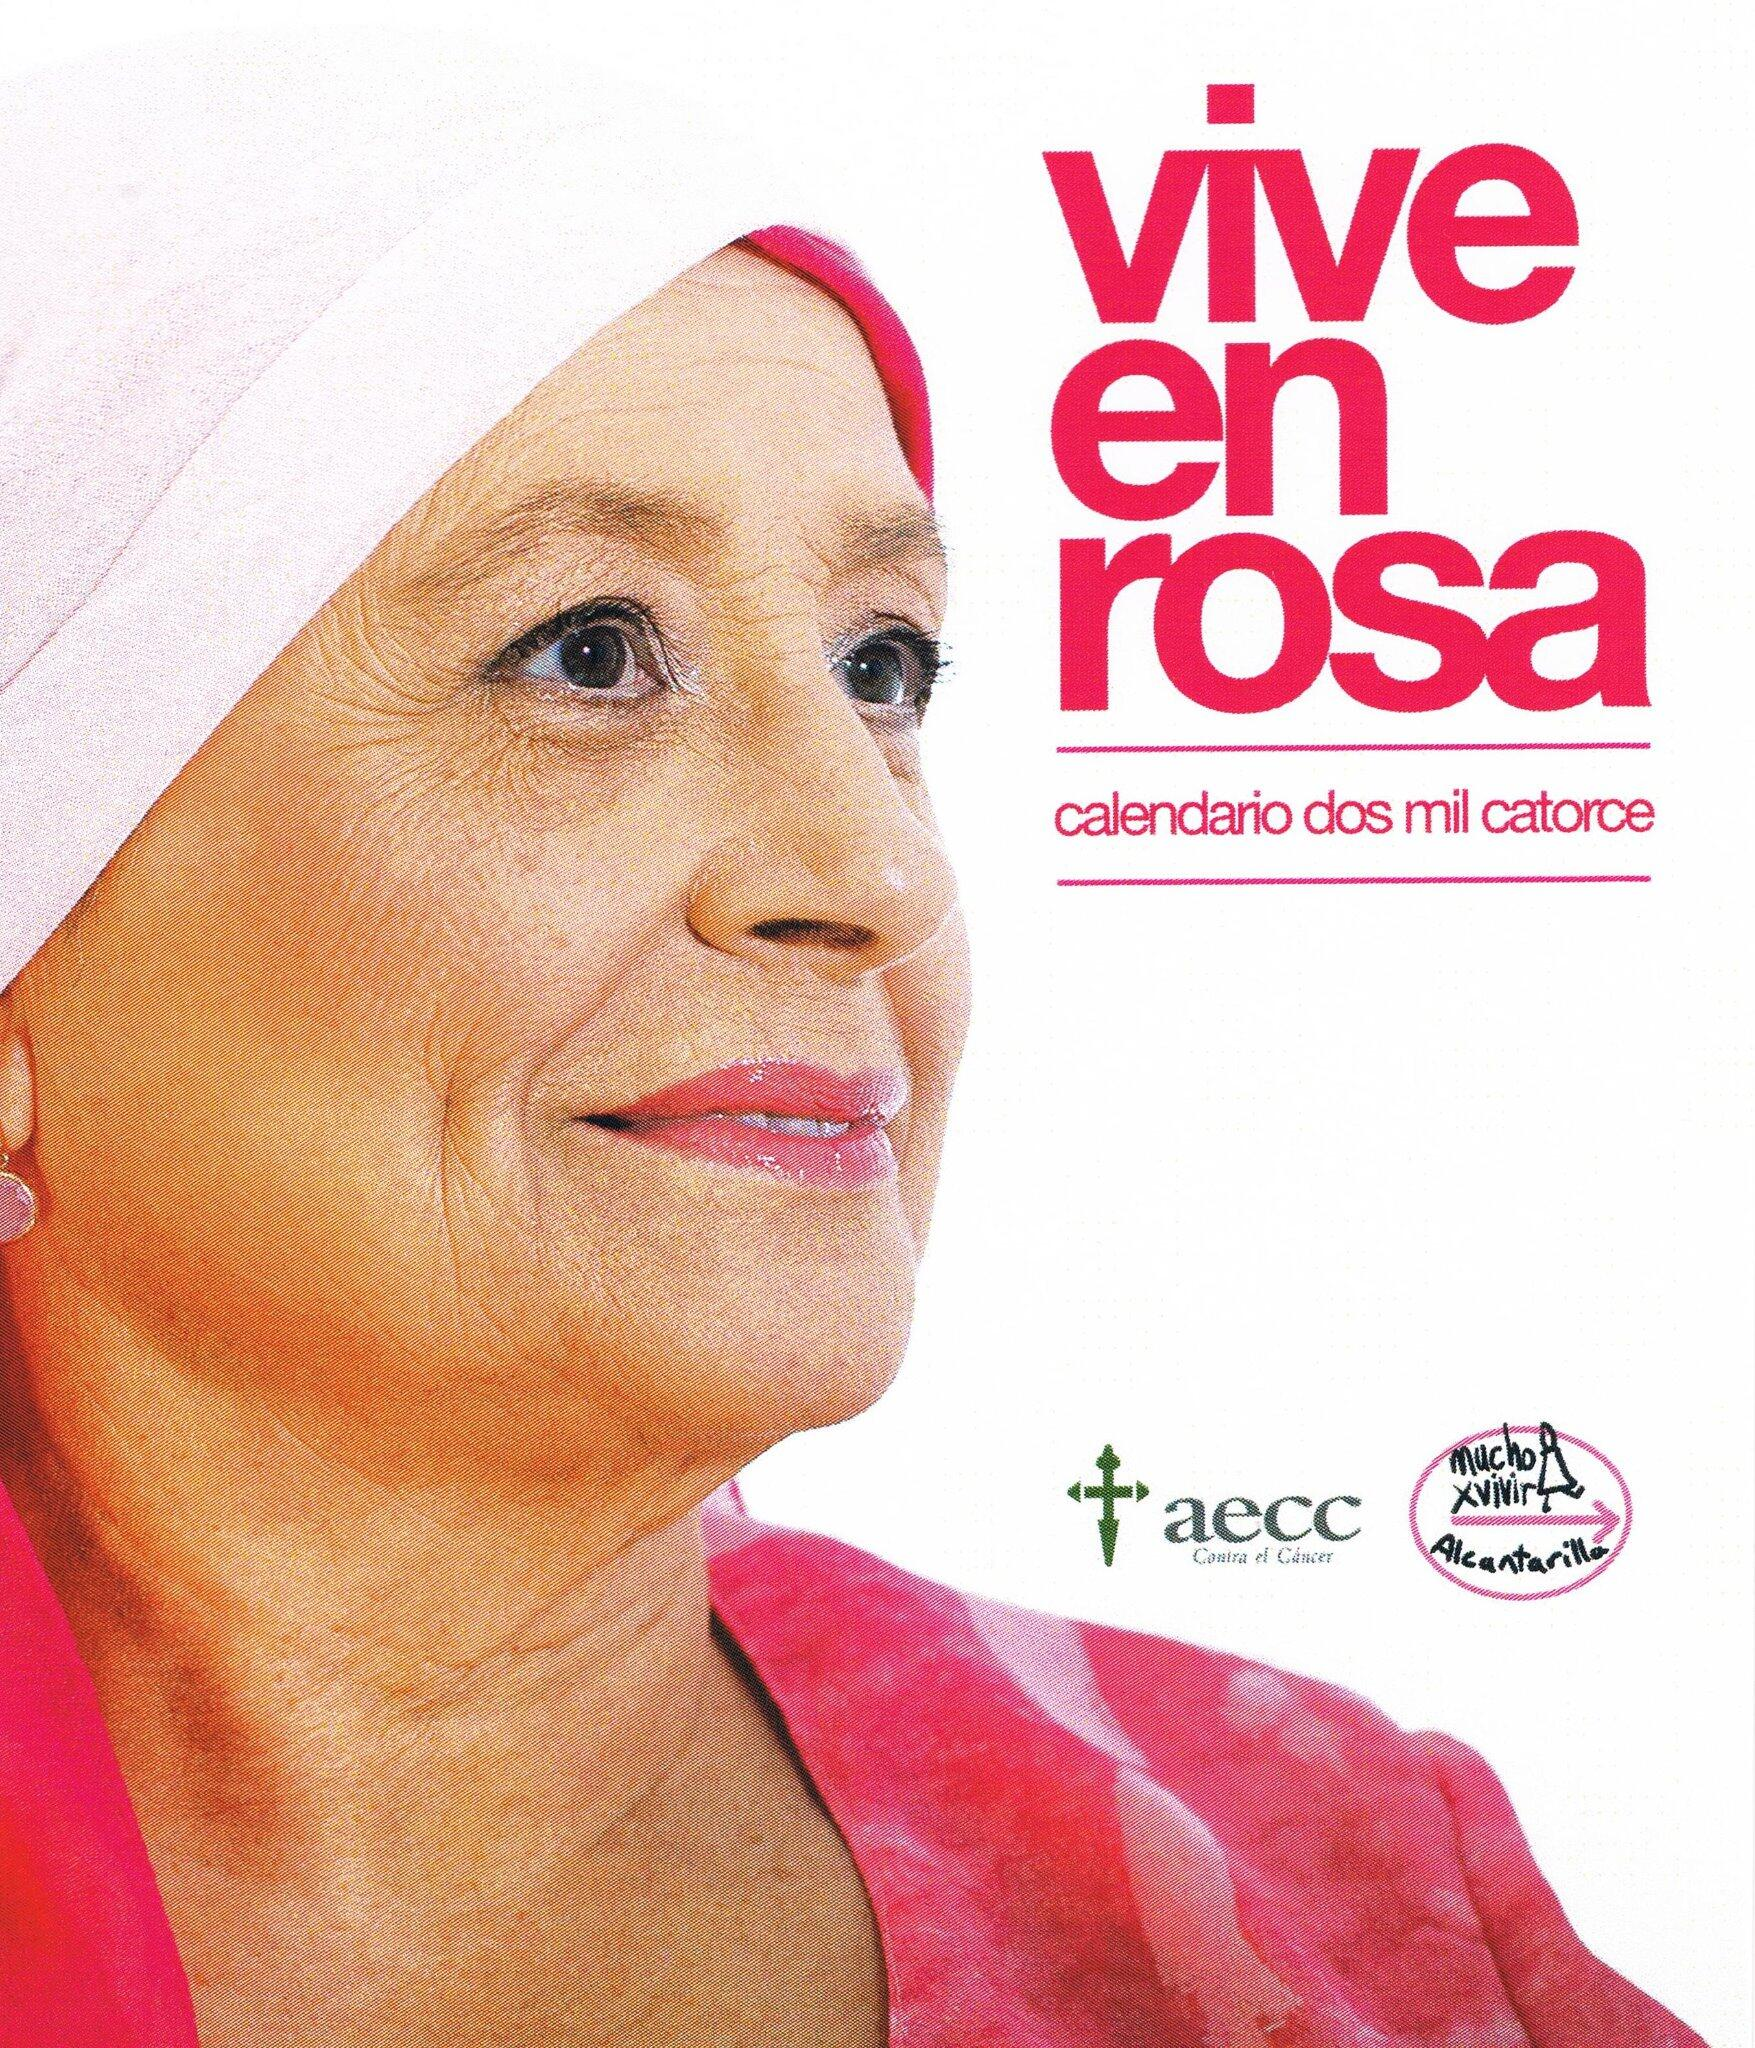 RT @MuchoXVivirA: Portada del Calendario VIVE EN ROSA http://t.co/9RJx9j371Z